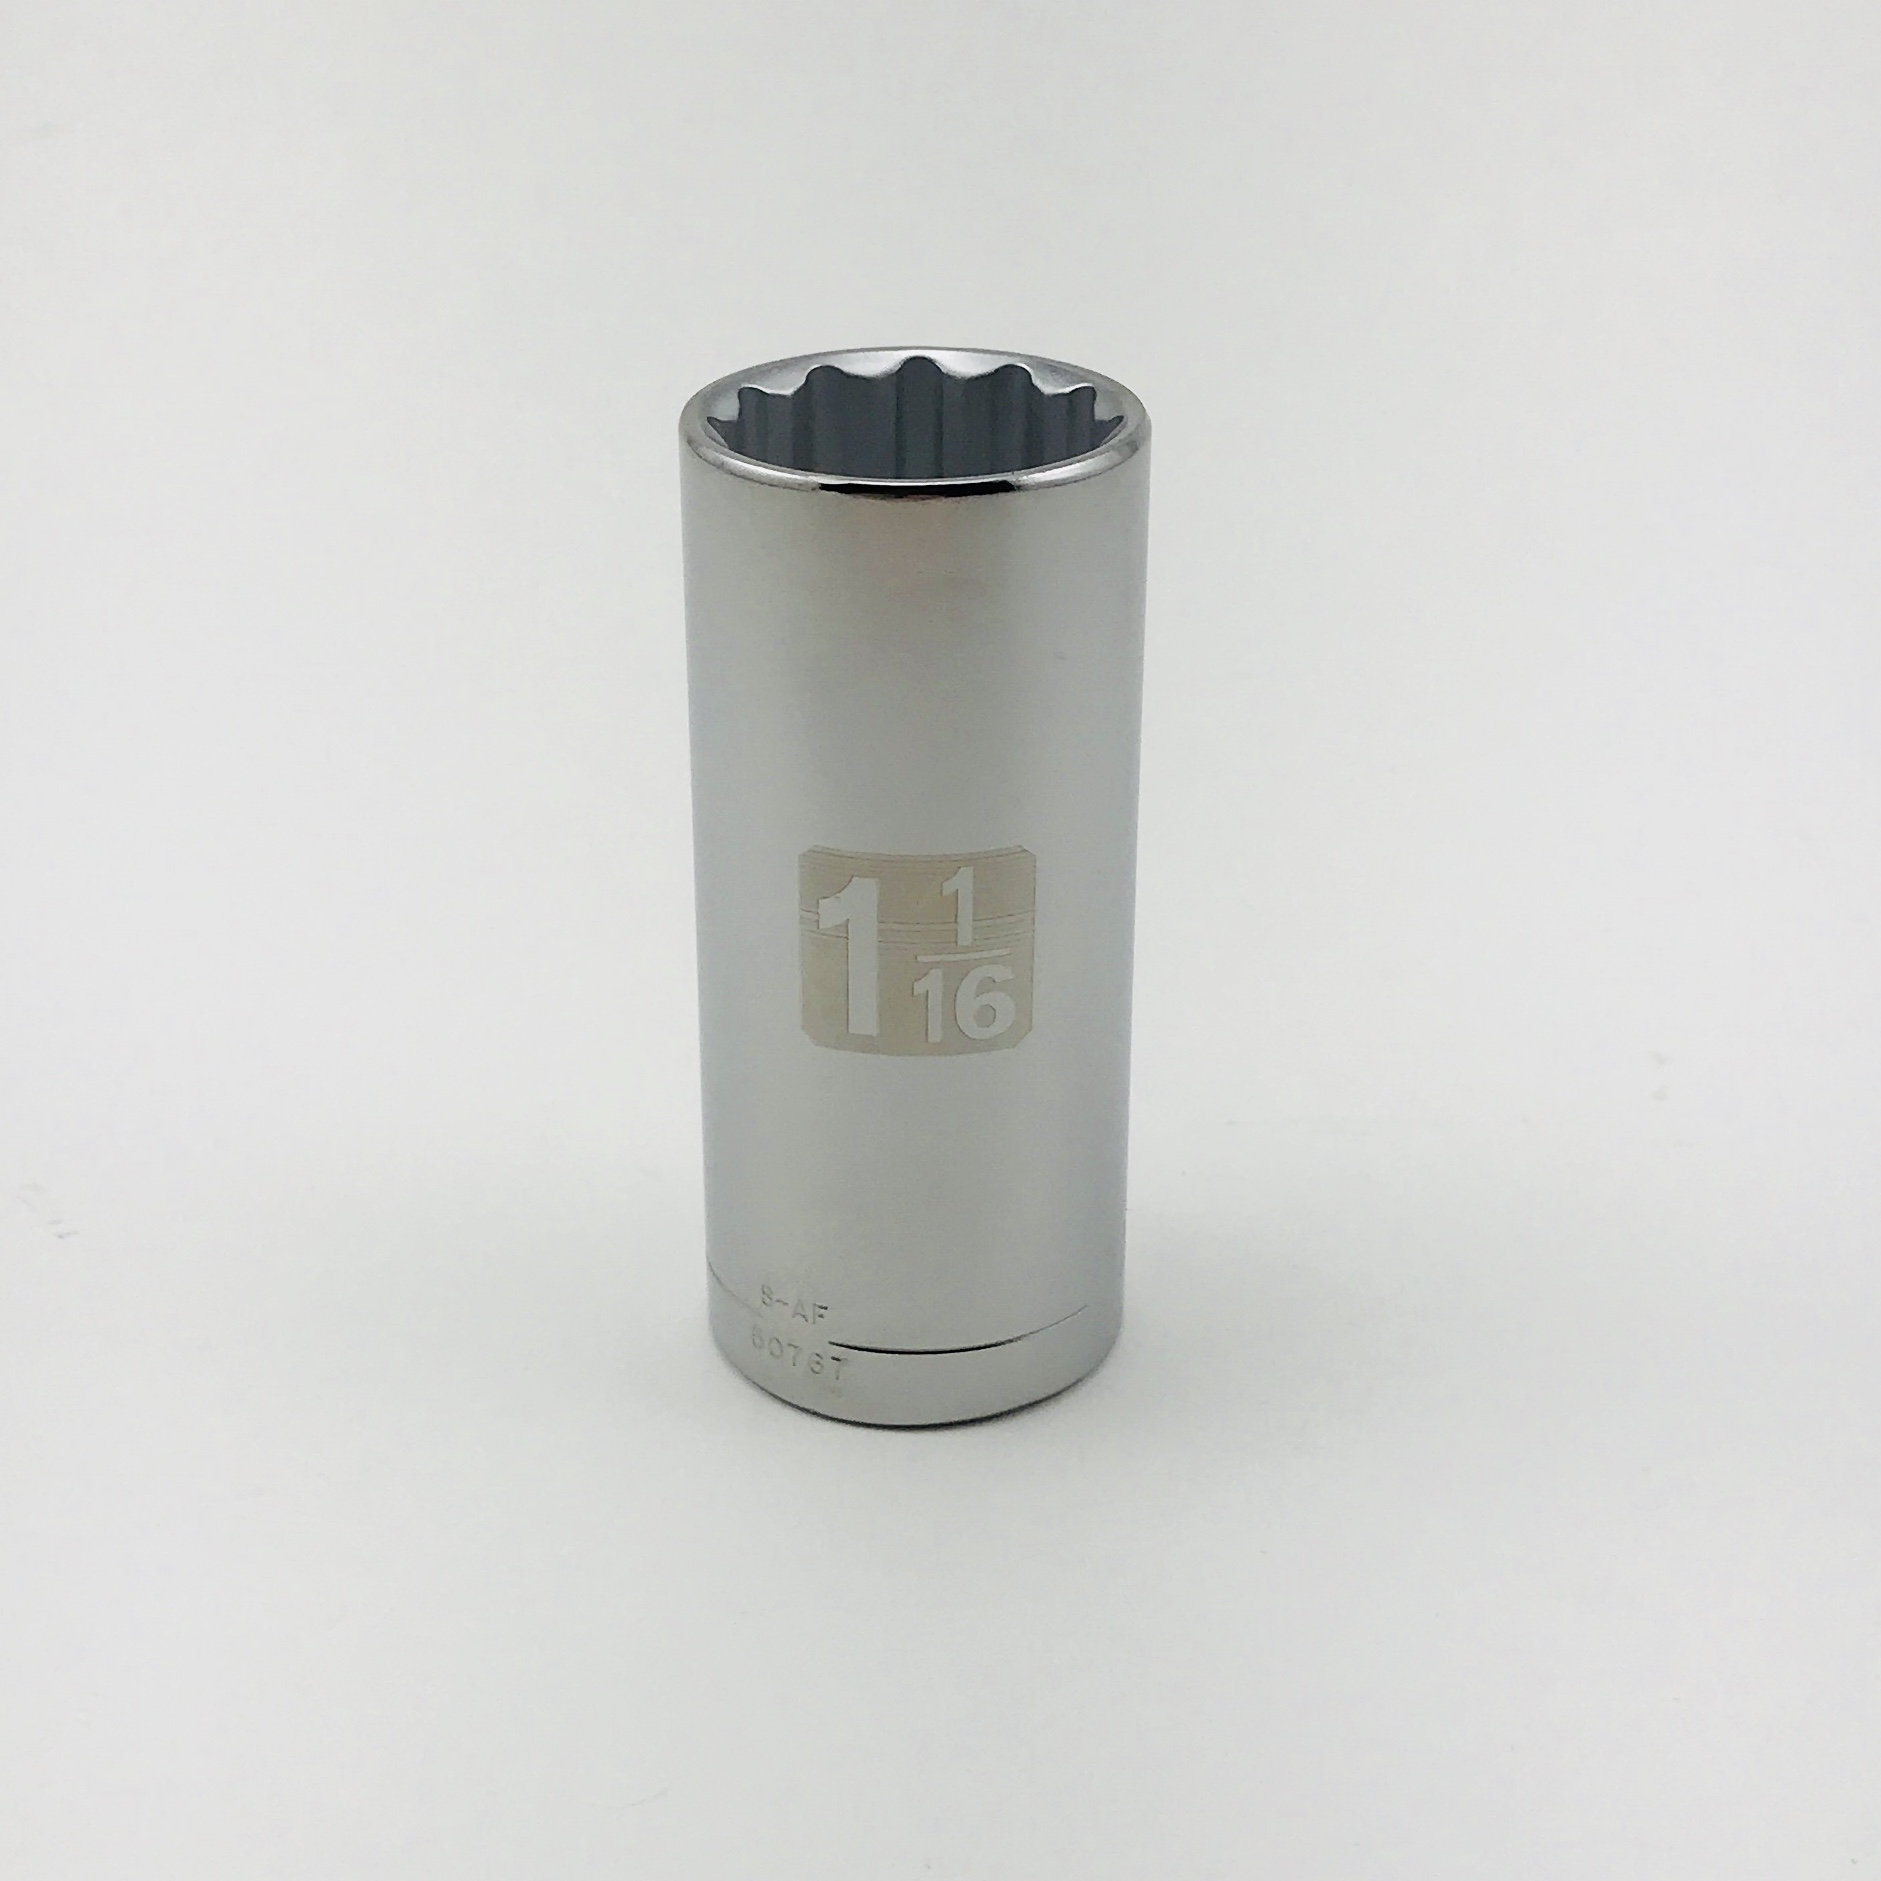 Craftsman 15mm socket air wick aroma gel